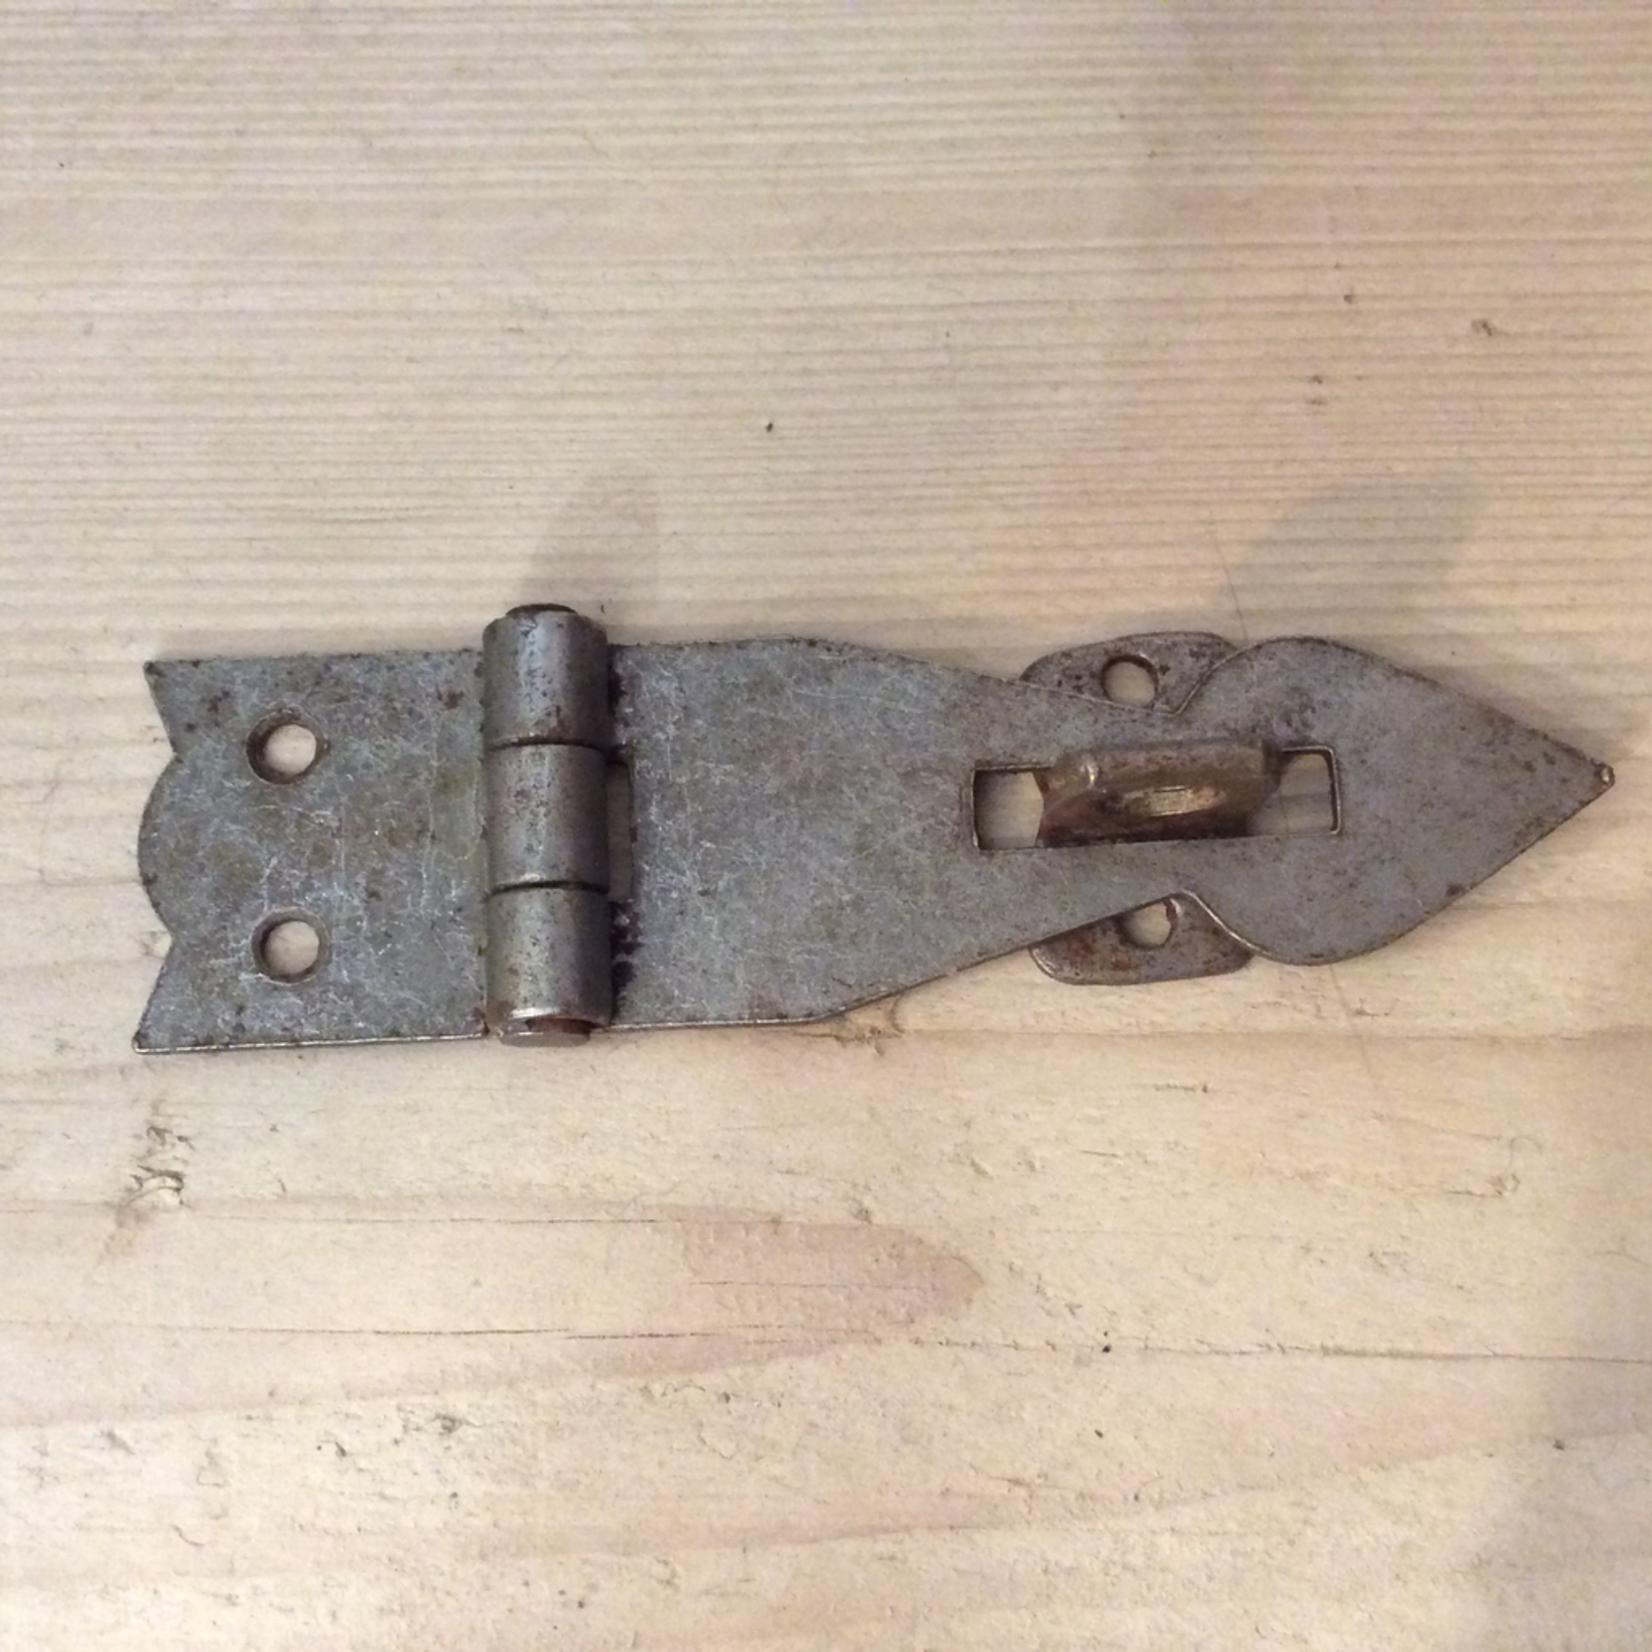 IRON RANGE Hasp & Staple Rusty Arrowhead Antique Iron 110mm